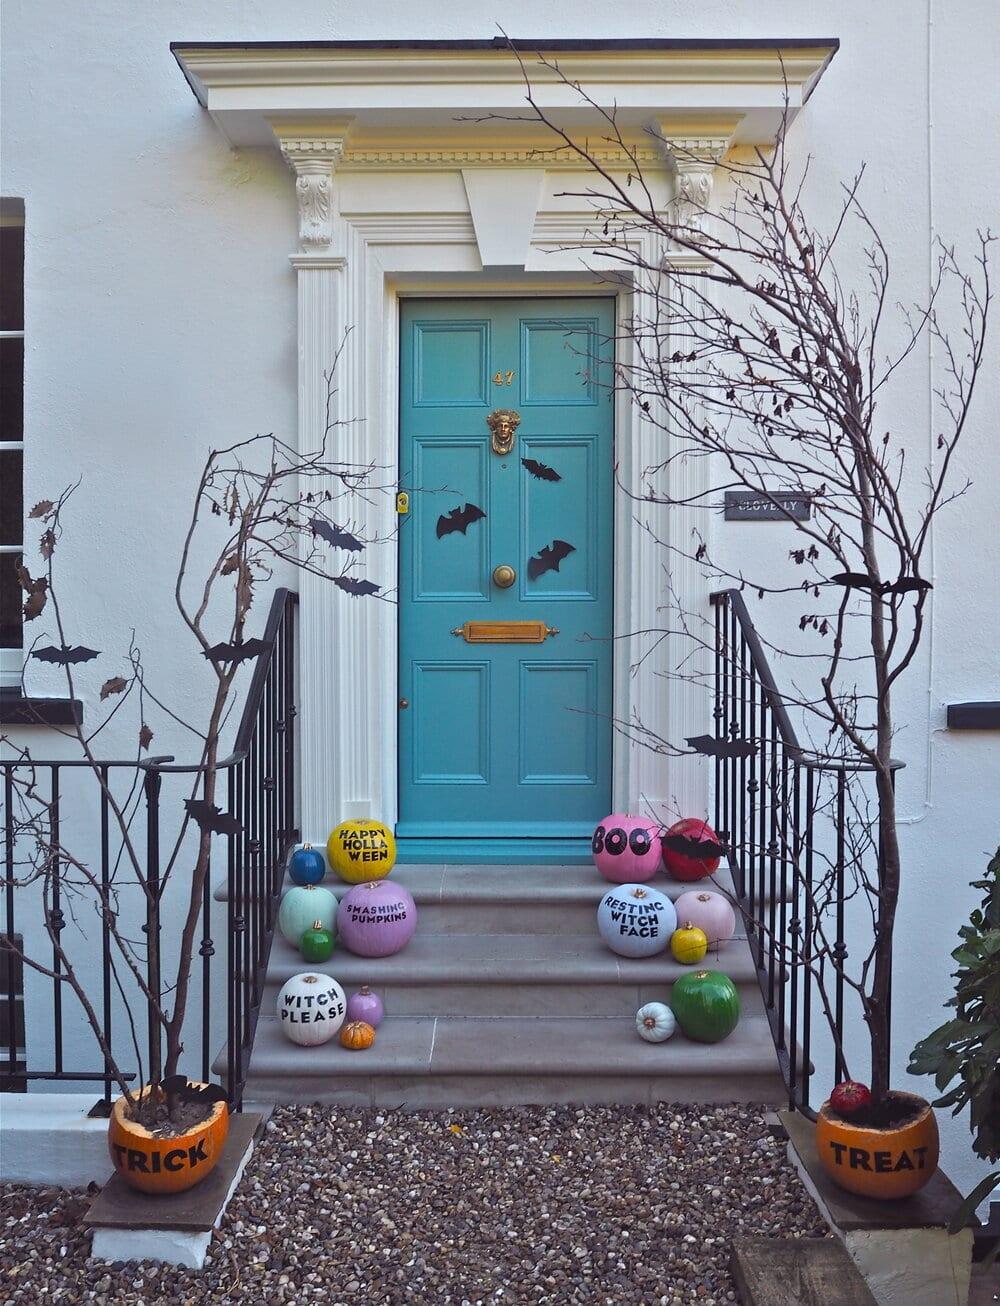 Fantastic display of pumpkins all created by Melanie! Instagram  @melanielissackinteriors